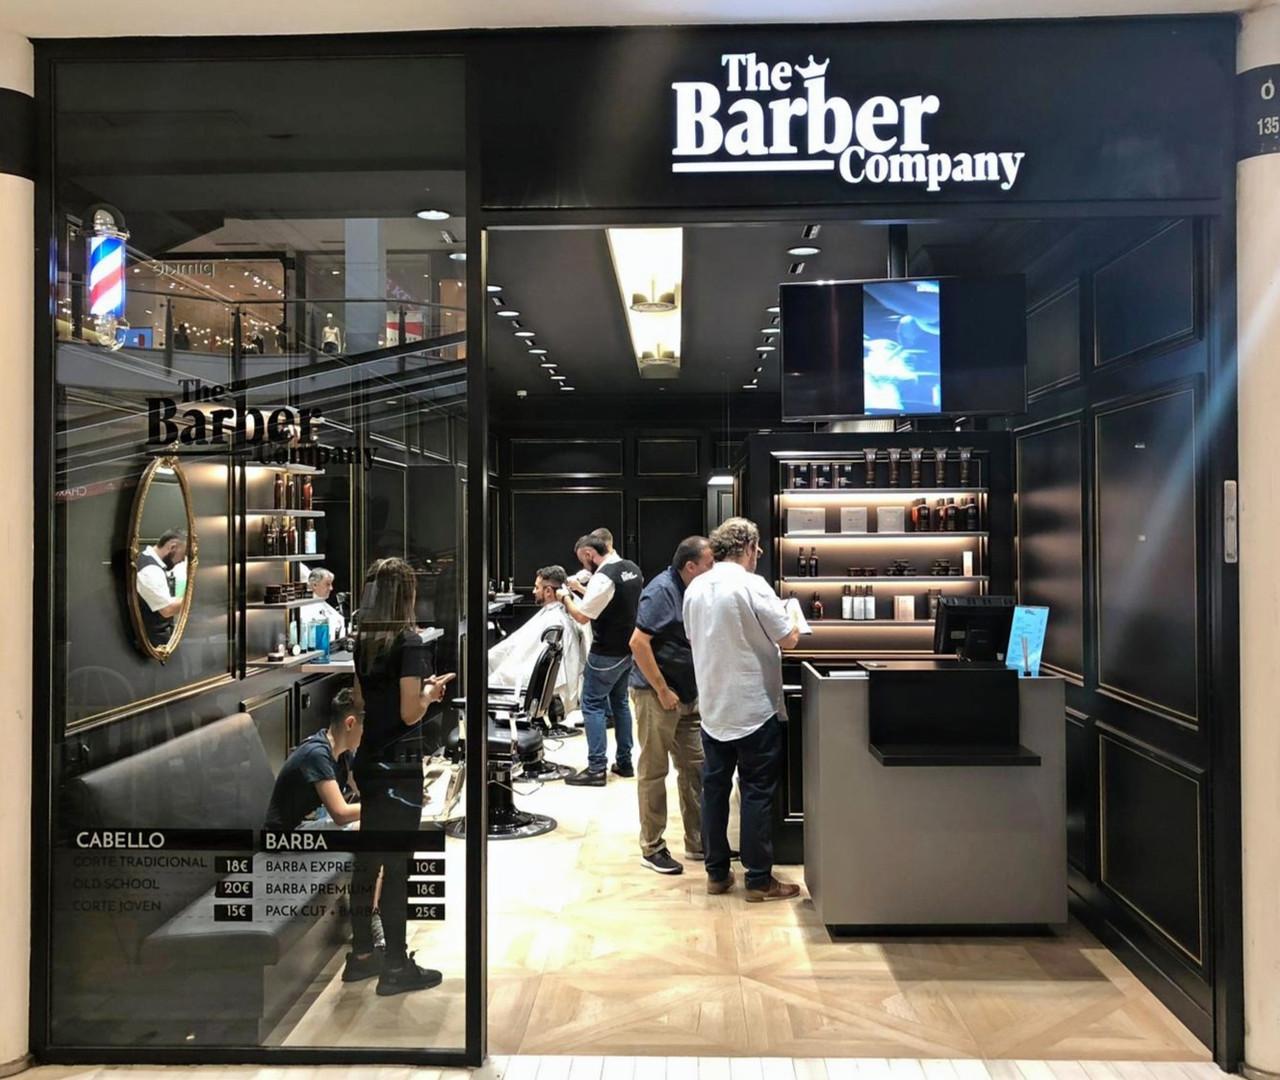 The Barber Company